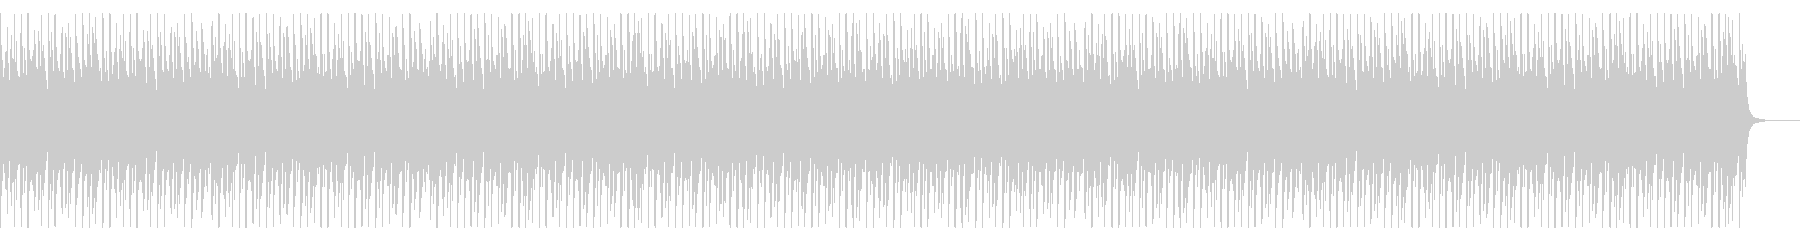 No base ver Metallophone WIND Refreshing's unreproduced waveform